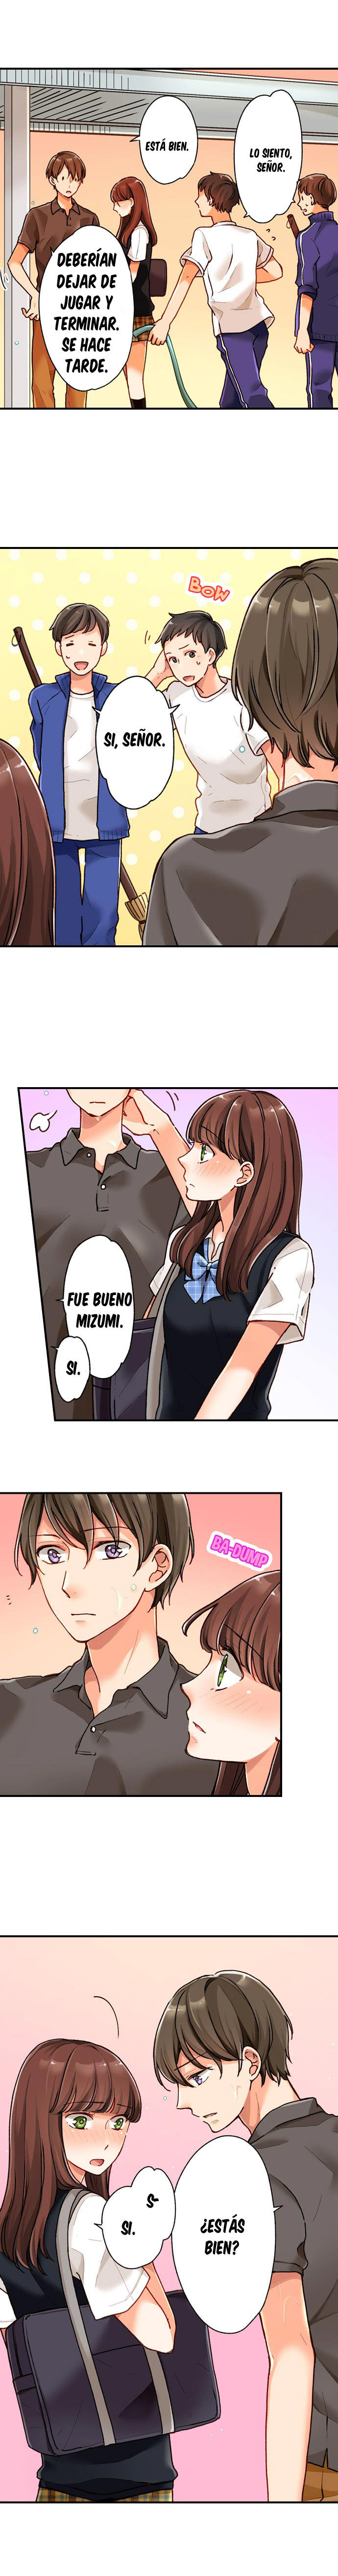 https://nine.mangadogs.com/es_manga/pic8/5/36677/946870/f892f4ecb19de5cfe9ec5344f6421d1d.jpg Page 5